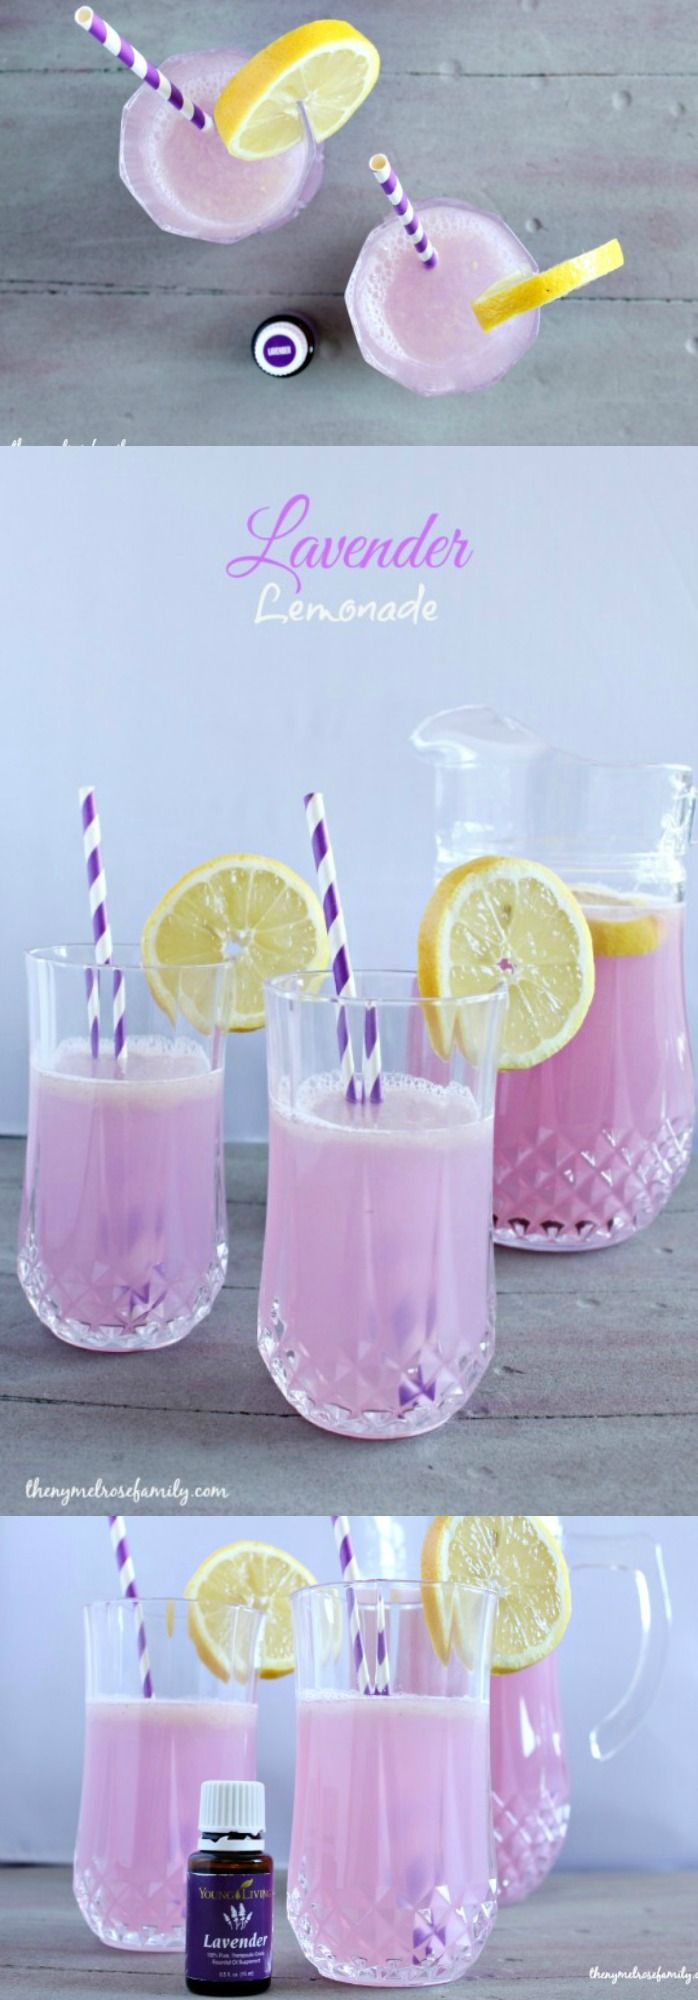 Leckere Lavendel-Limonade zum entspannen.